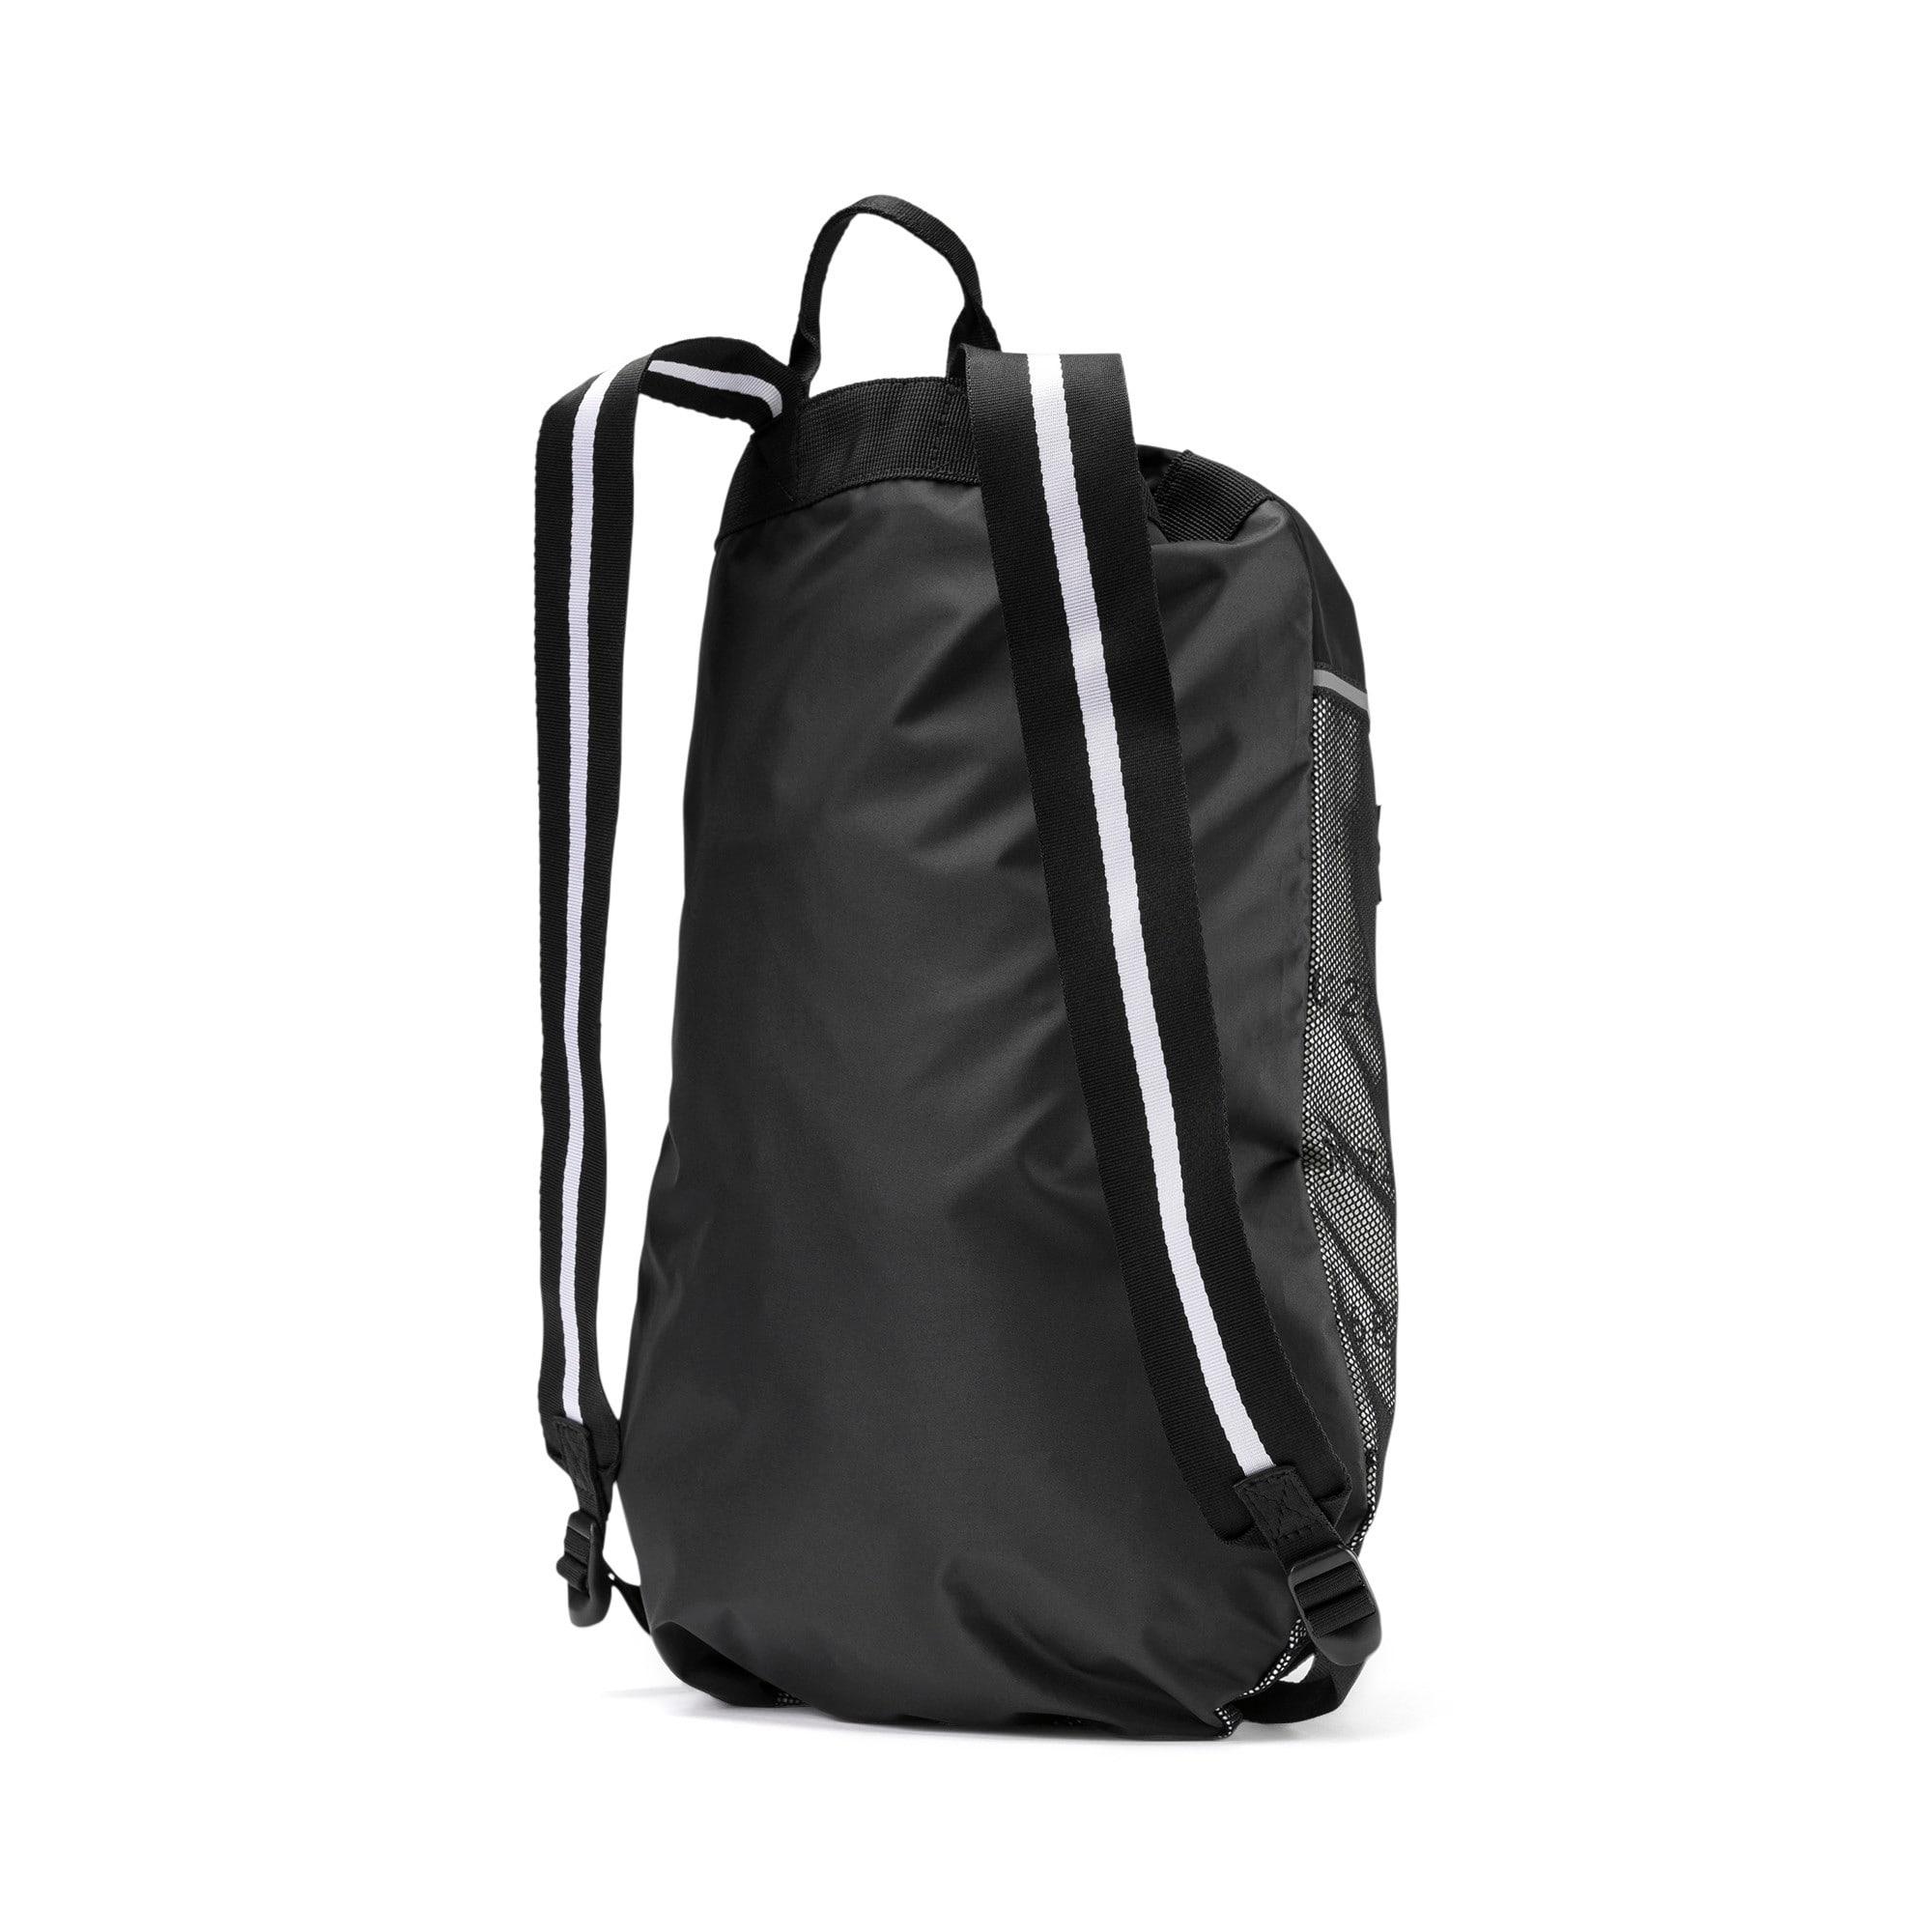 Thumbnail 3 of SG x PUMA Sport Smart Bag, Puma Black, medium